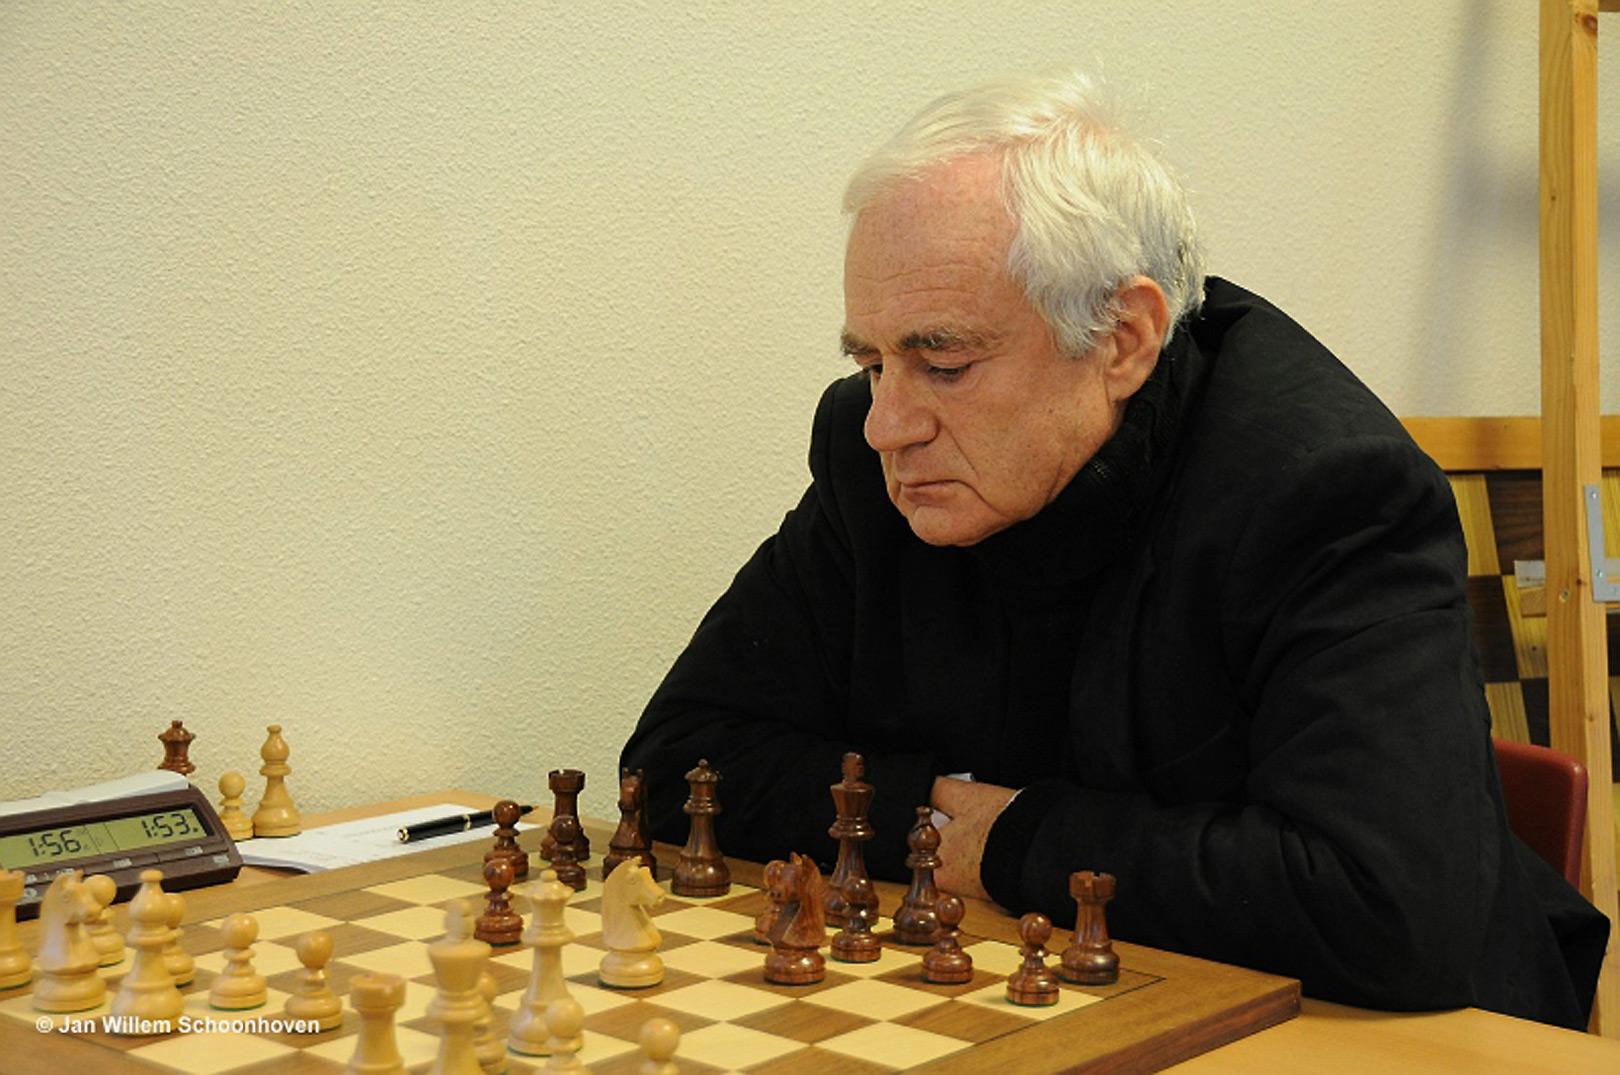 Фото: schaakclubenpassant.nl